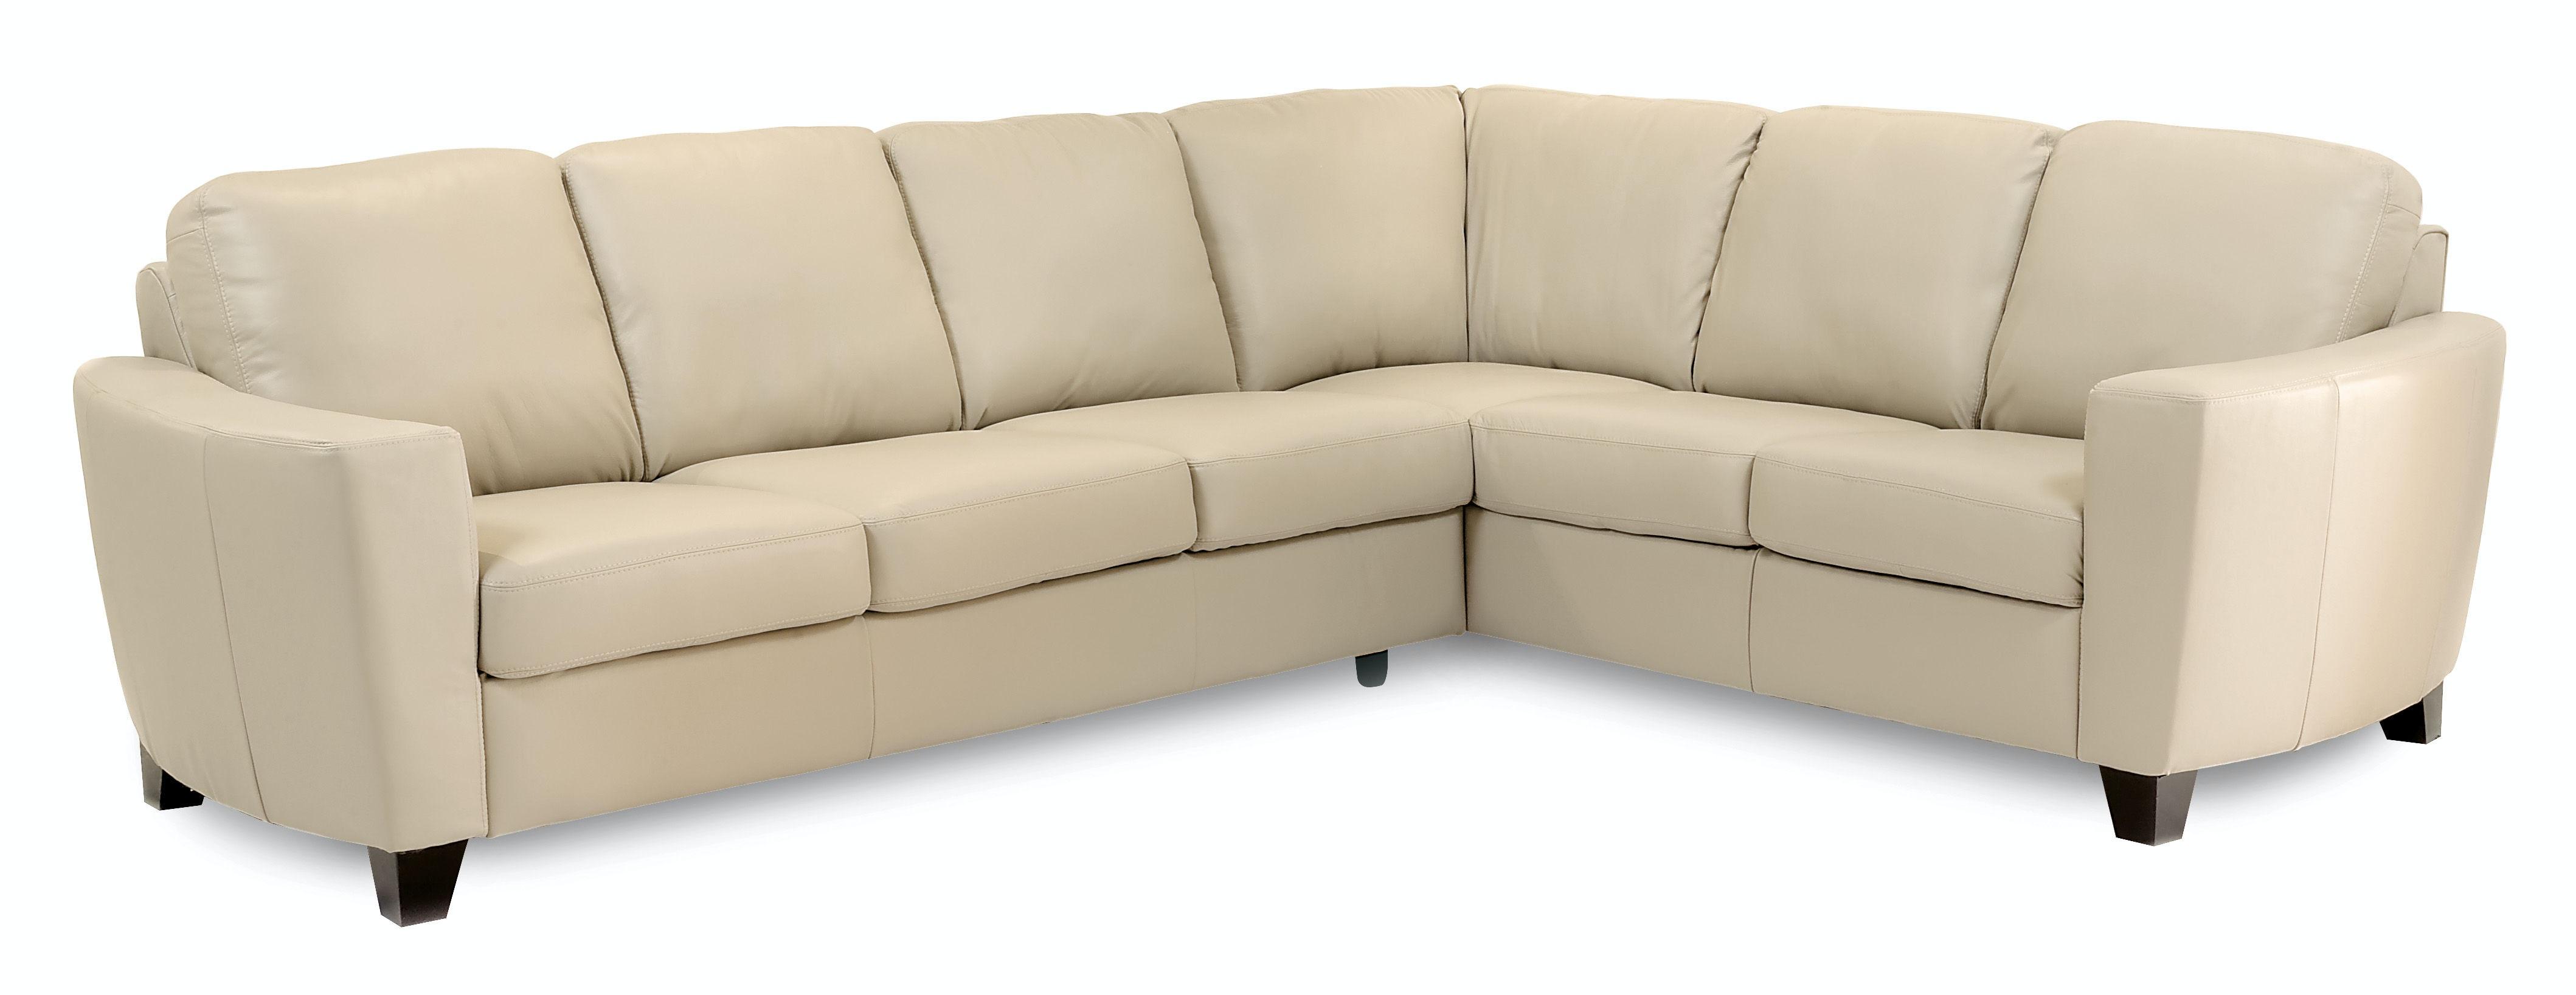 Palliser Furniture Leeds Sectional 77328 Sectional